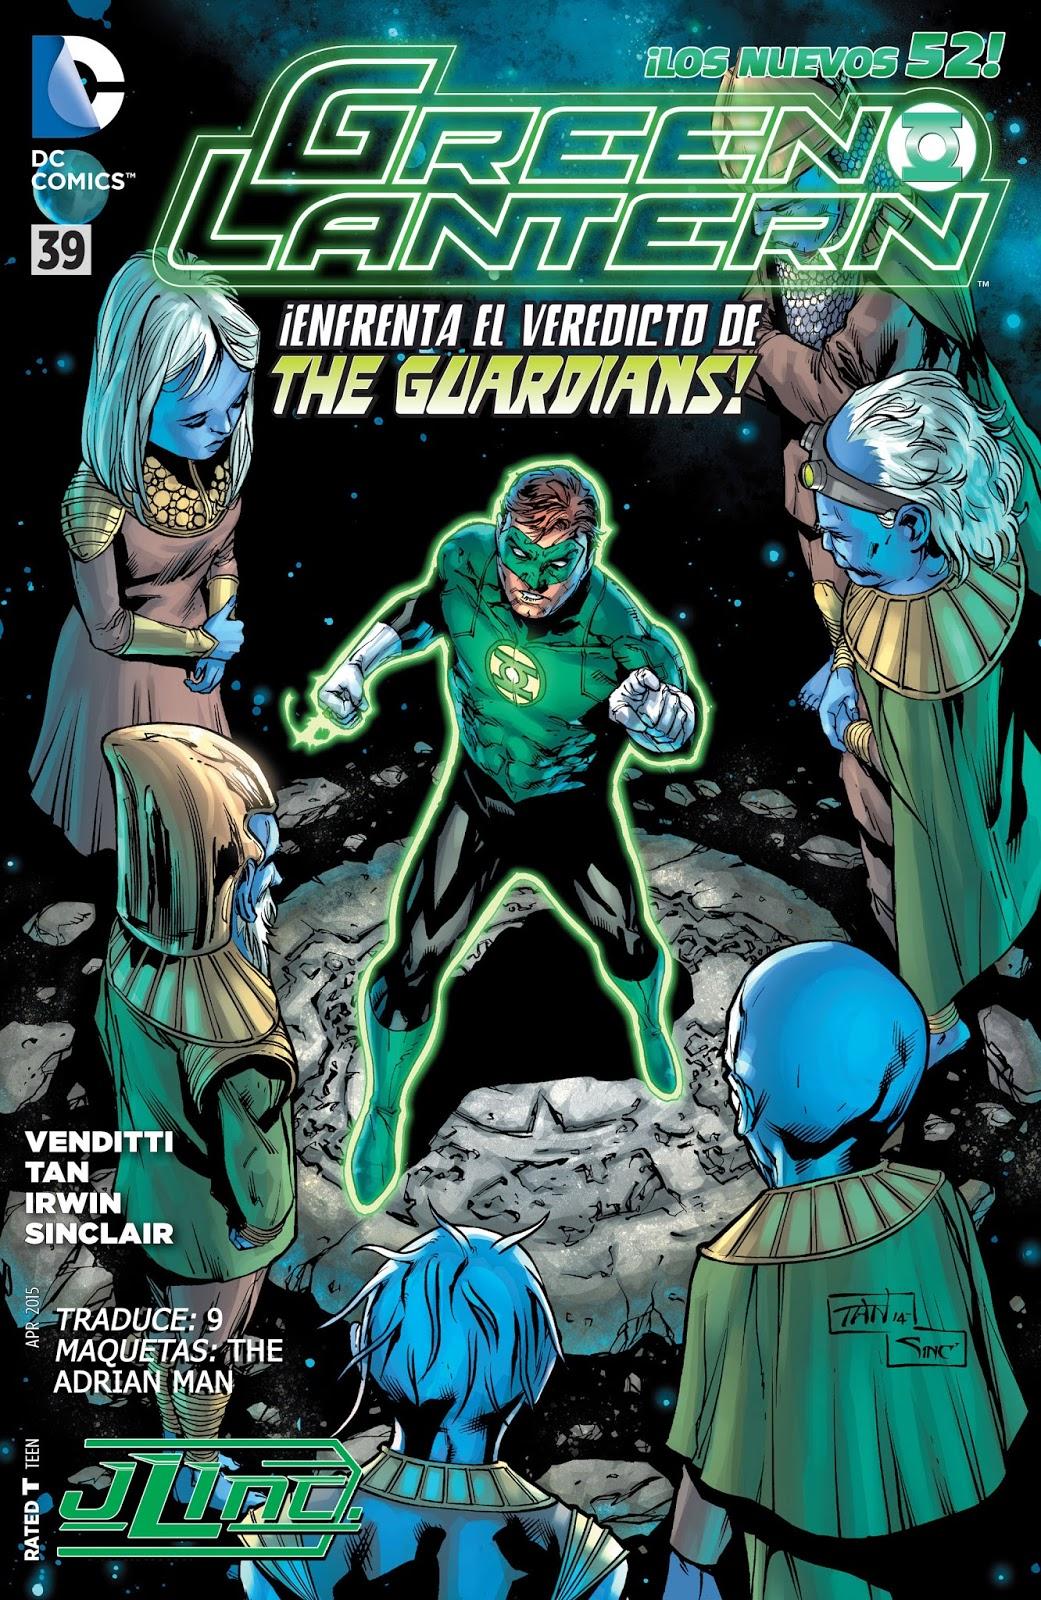 http://www.mediafire.com/download/6246m2sjcwc2utg/Green+Lantern+v5+%2339+-Justice+League+Incorporated.cbr#39_-Justice_League_Incorporated.cbr